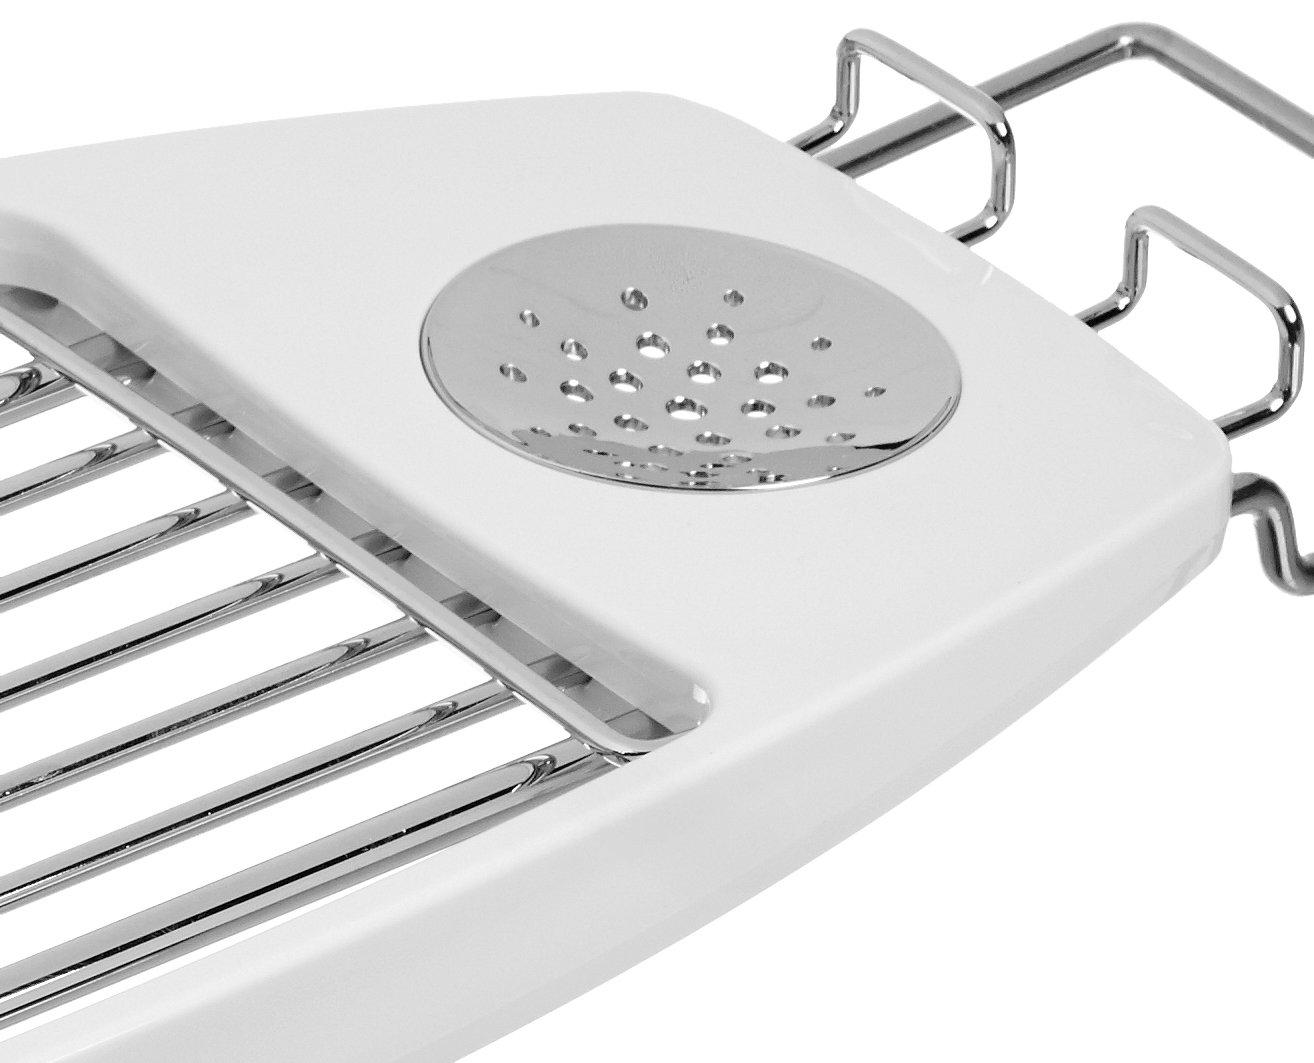 AmazonBasics Bathtub Caddy - drain